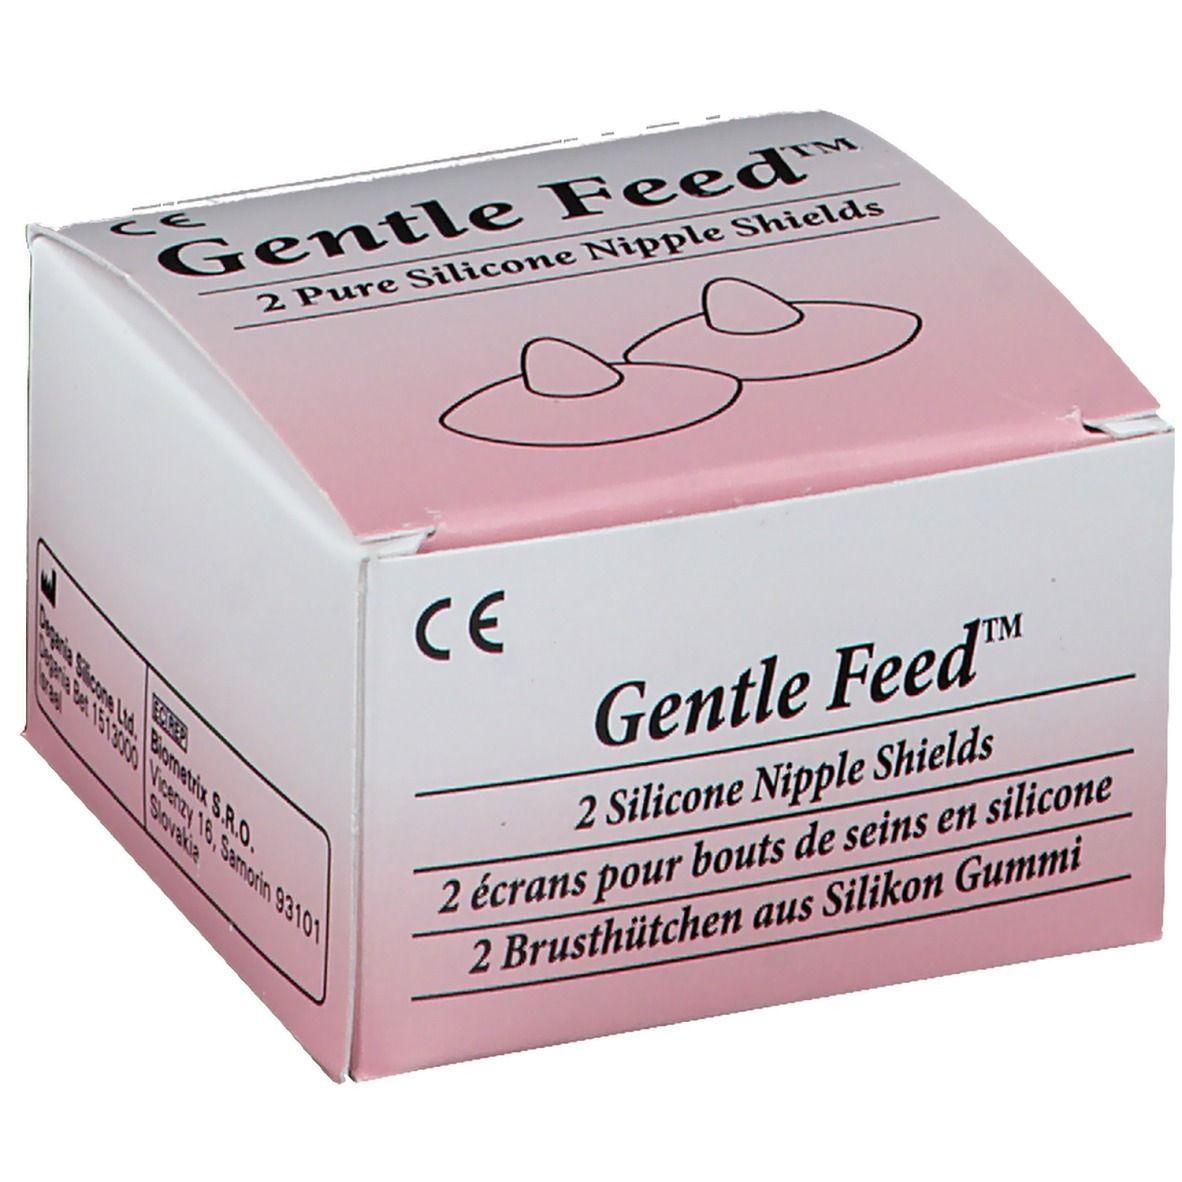 Degania Gentle Feed™ Bout de seins Silicone